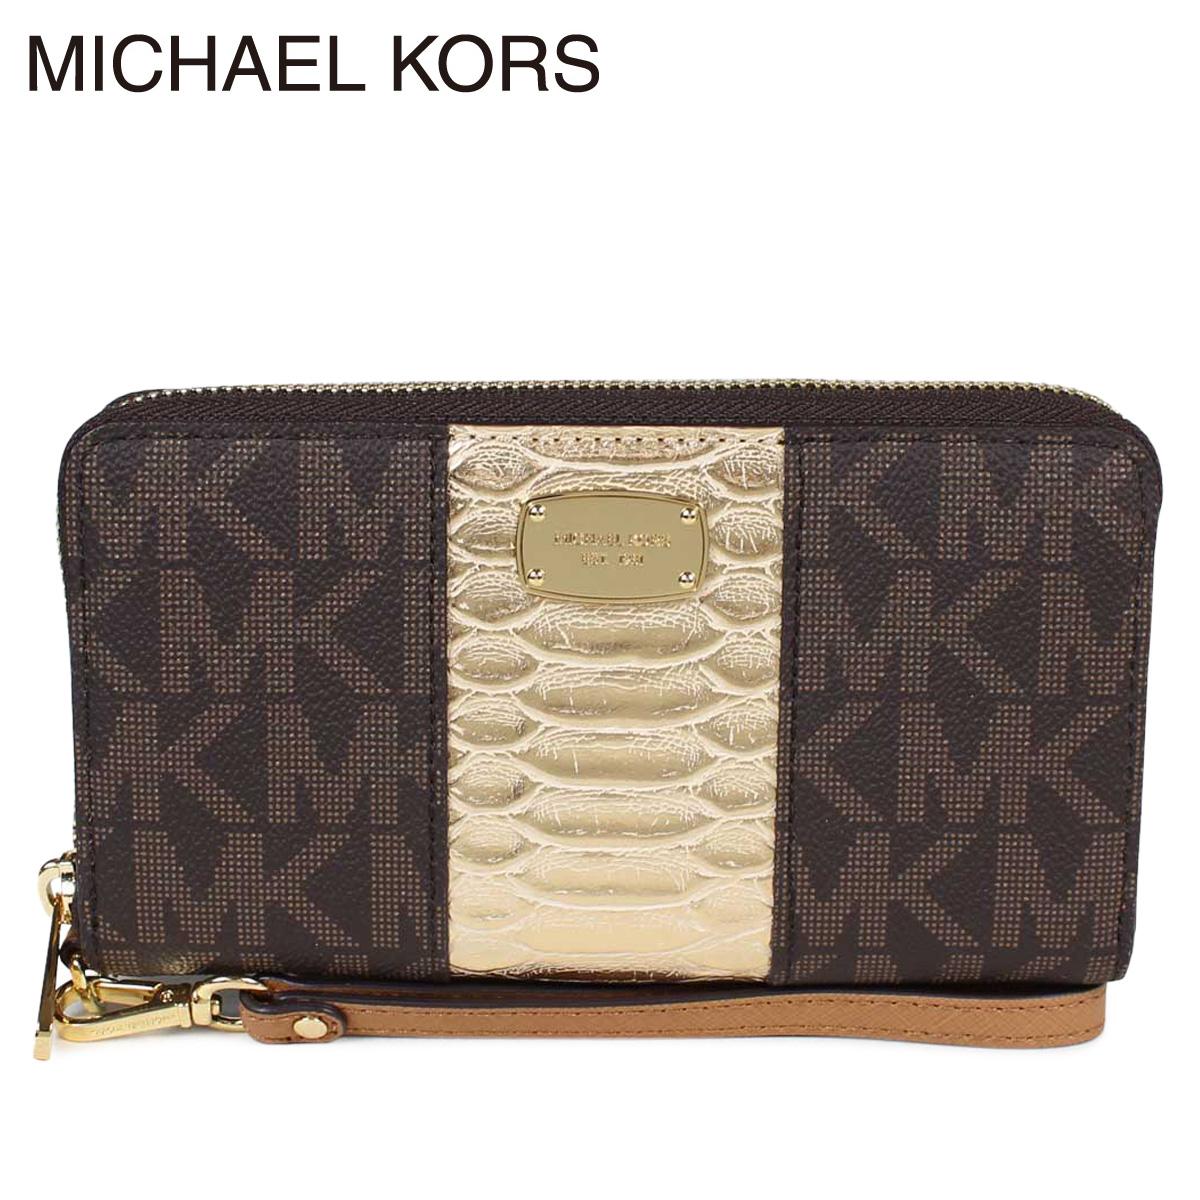 6c72aa61f1e8 Sugar Online Shop  MICHAEL KORS Michael Kors wallet long wallet ...